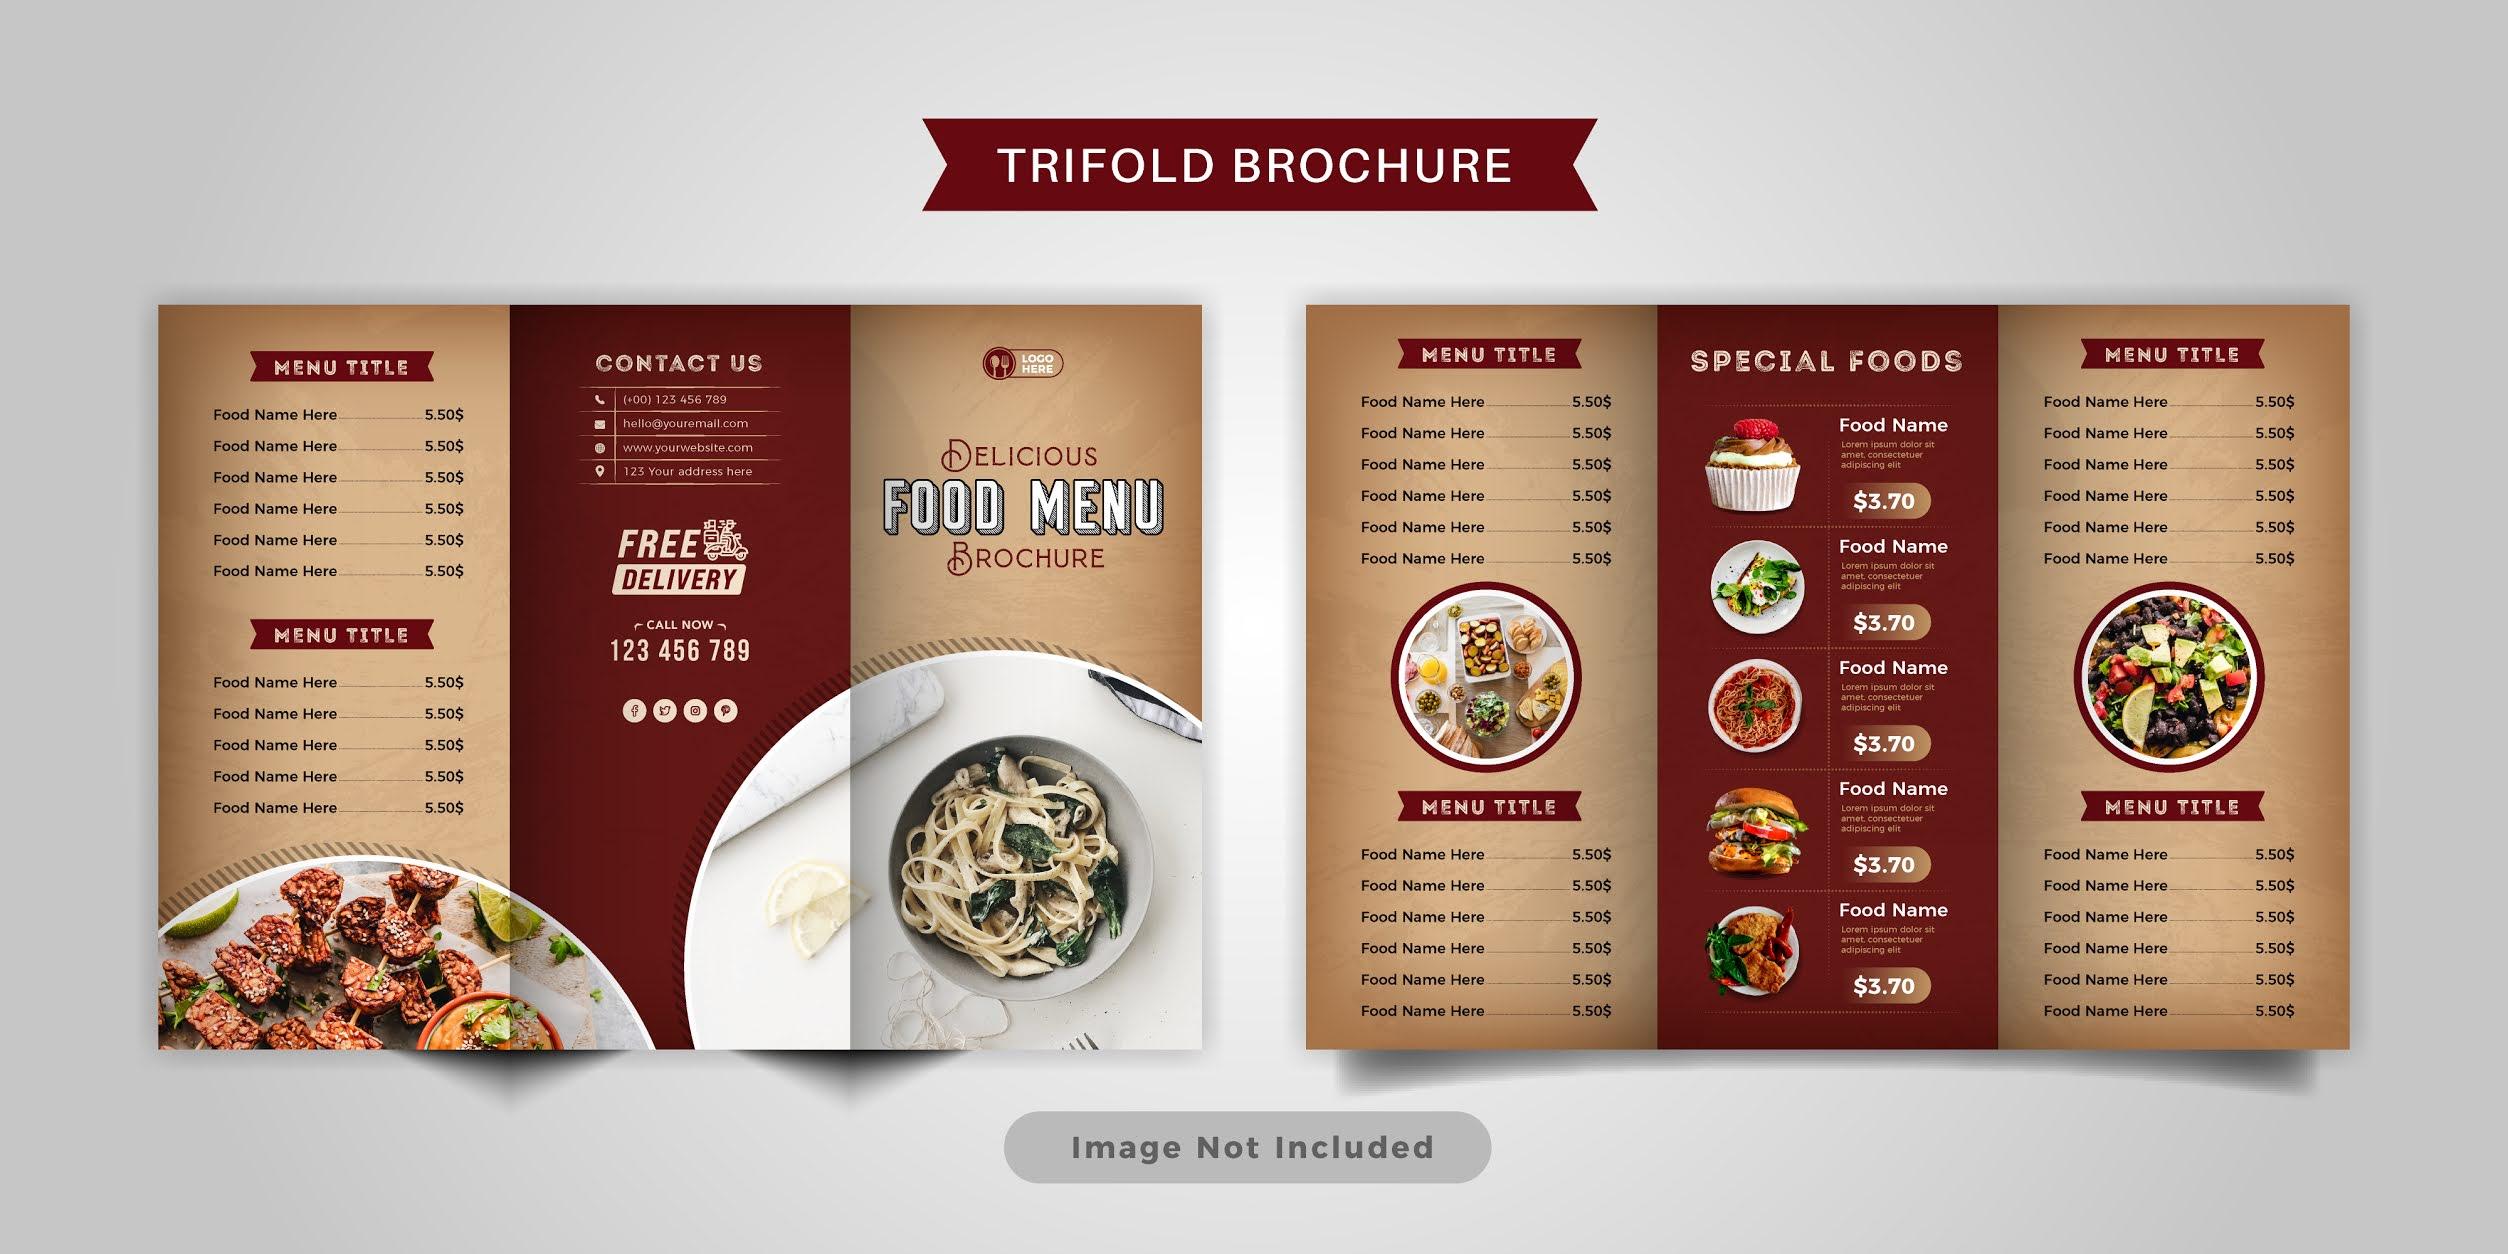 Free download food brochure 7 professional designs 2 set in vector format